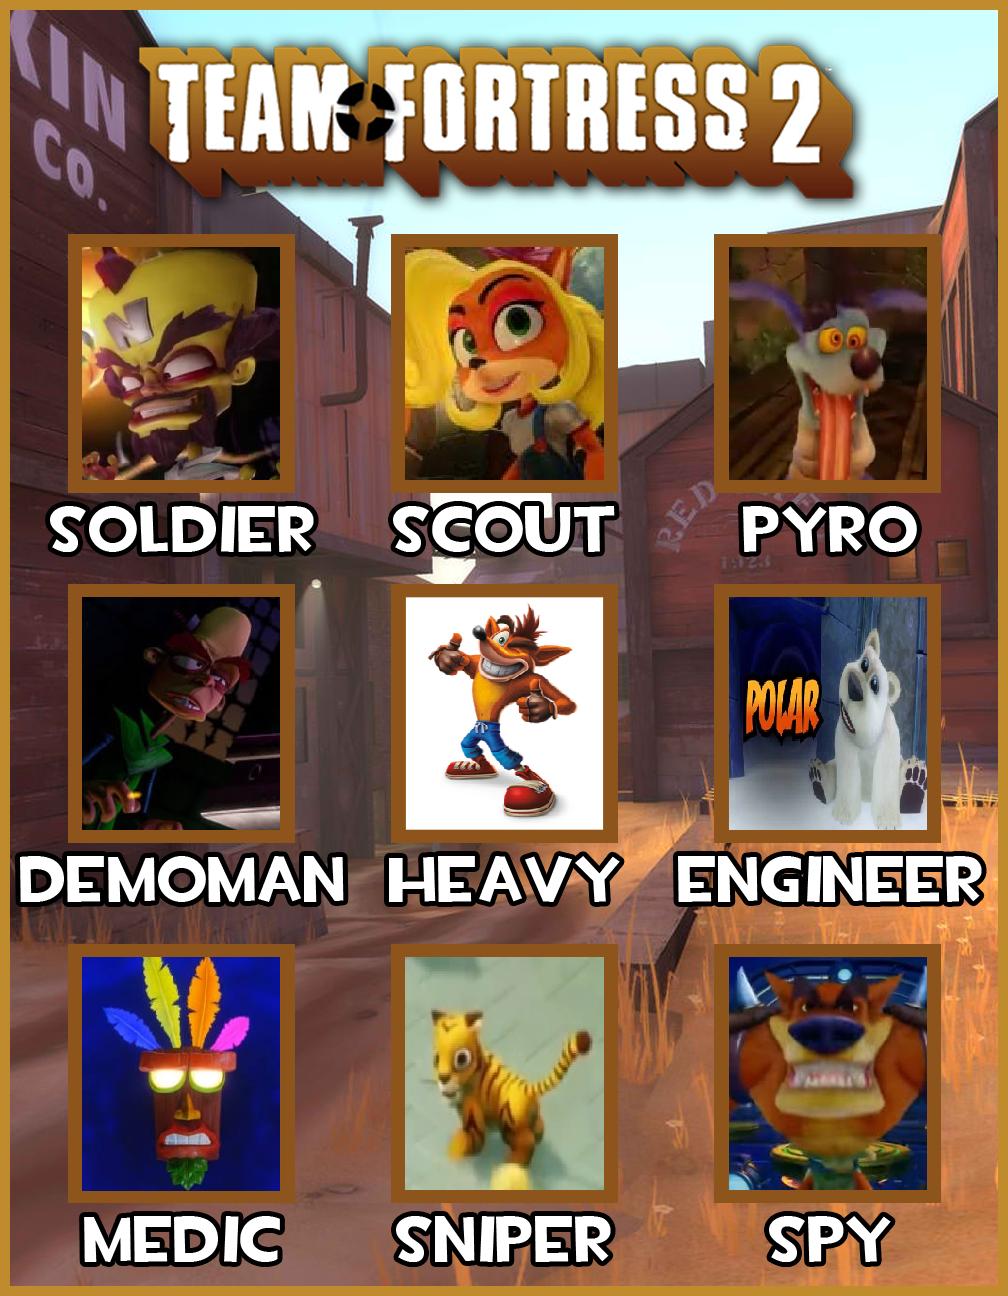 Team Fortress 2 Crew Meme Crash Bandicoot By Off Brandicoot On